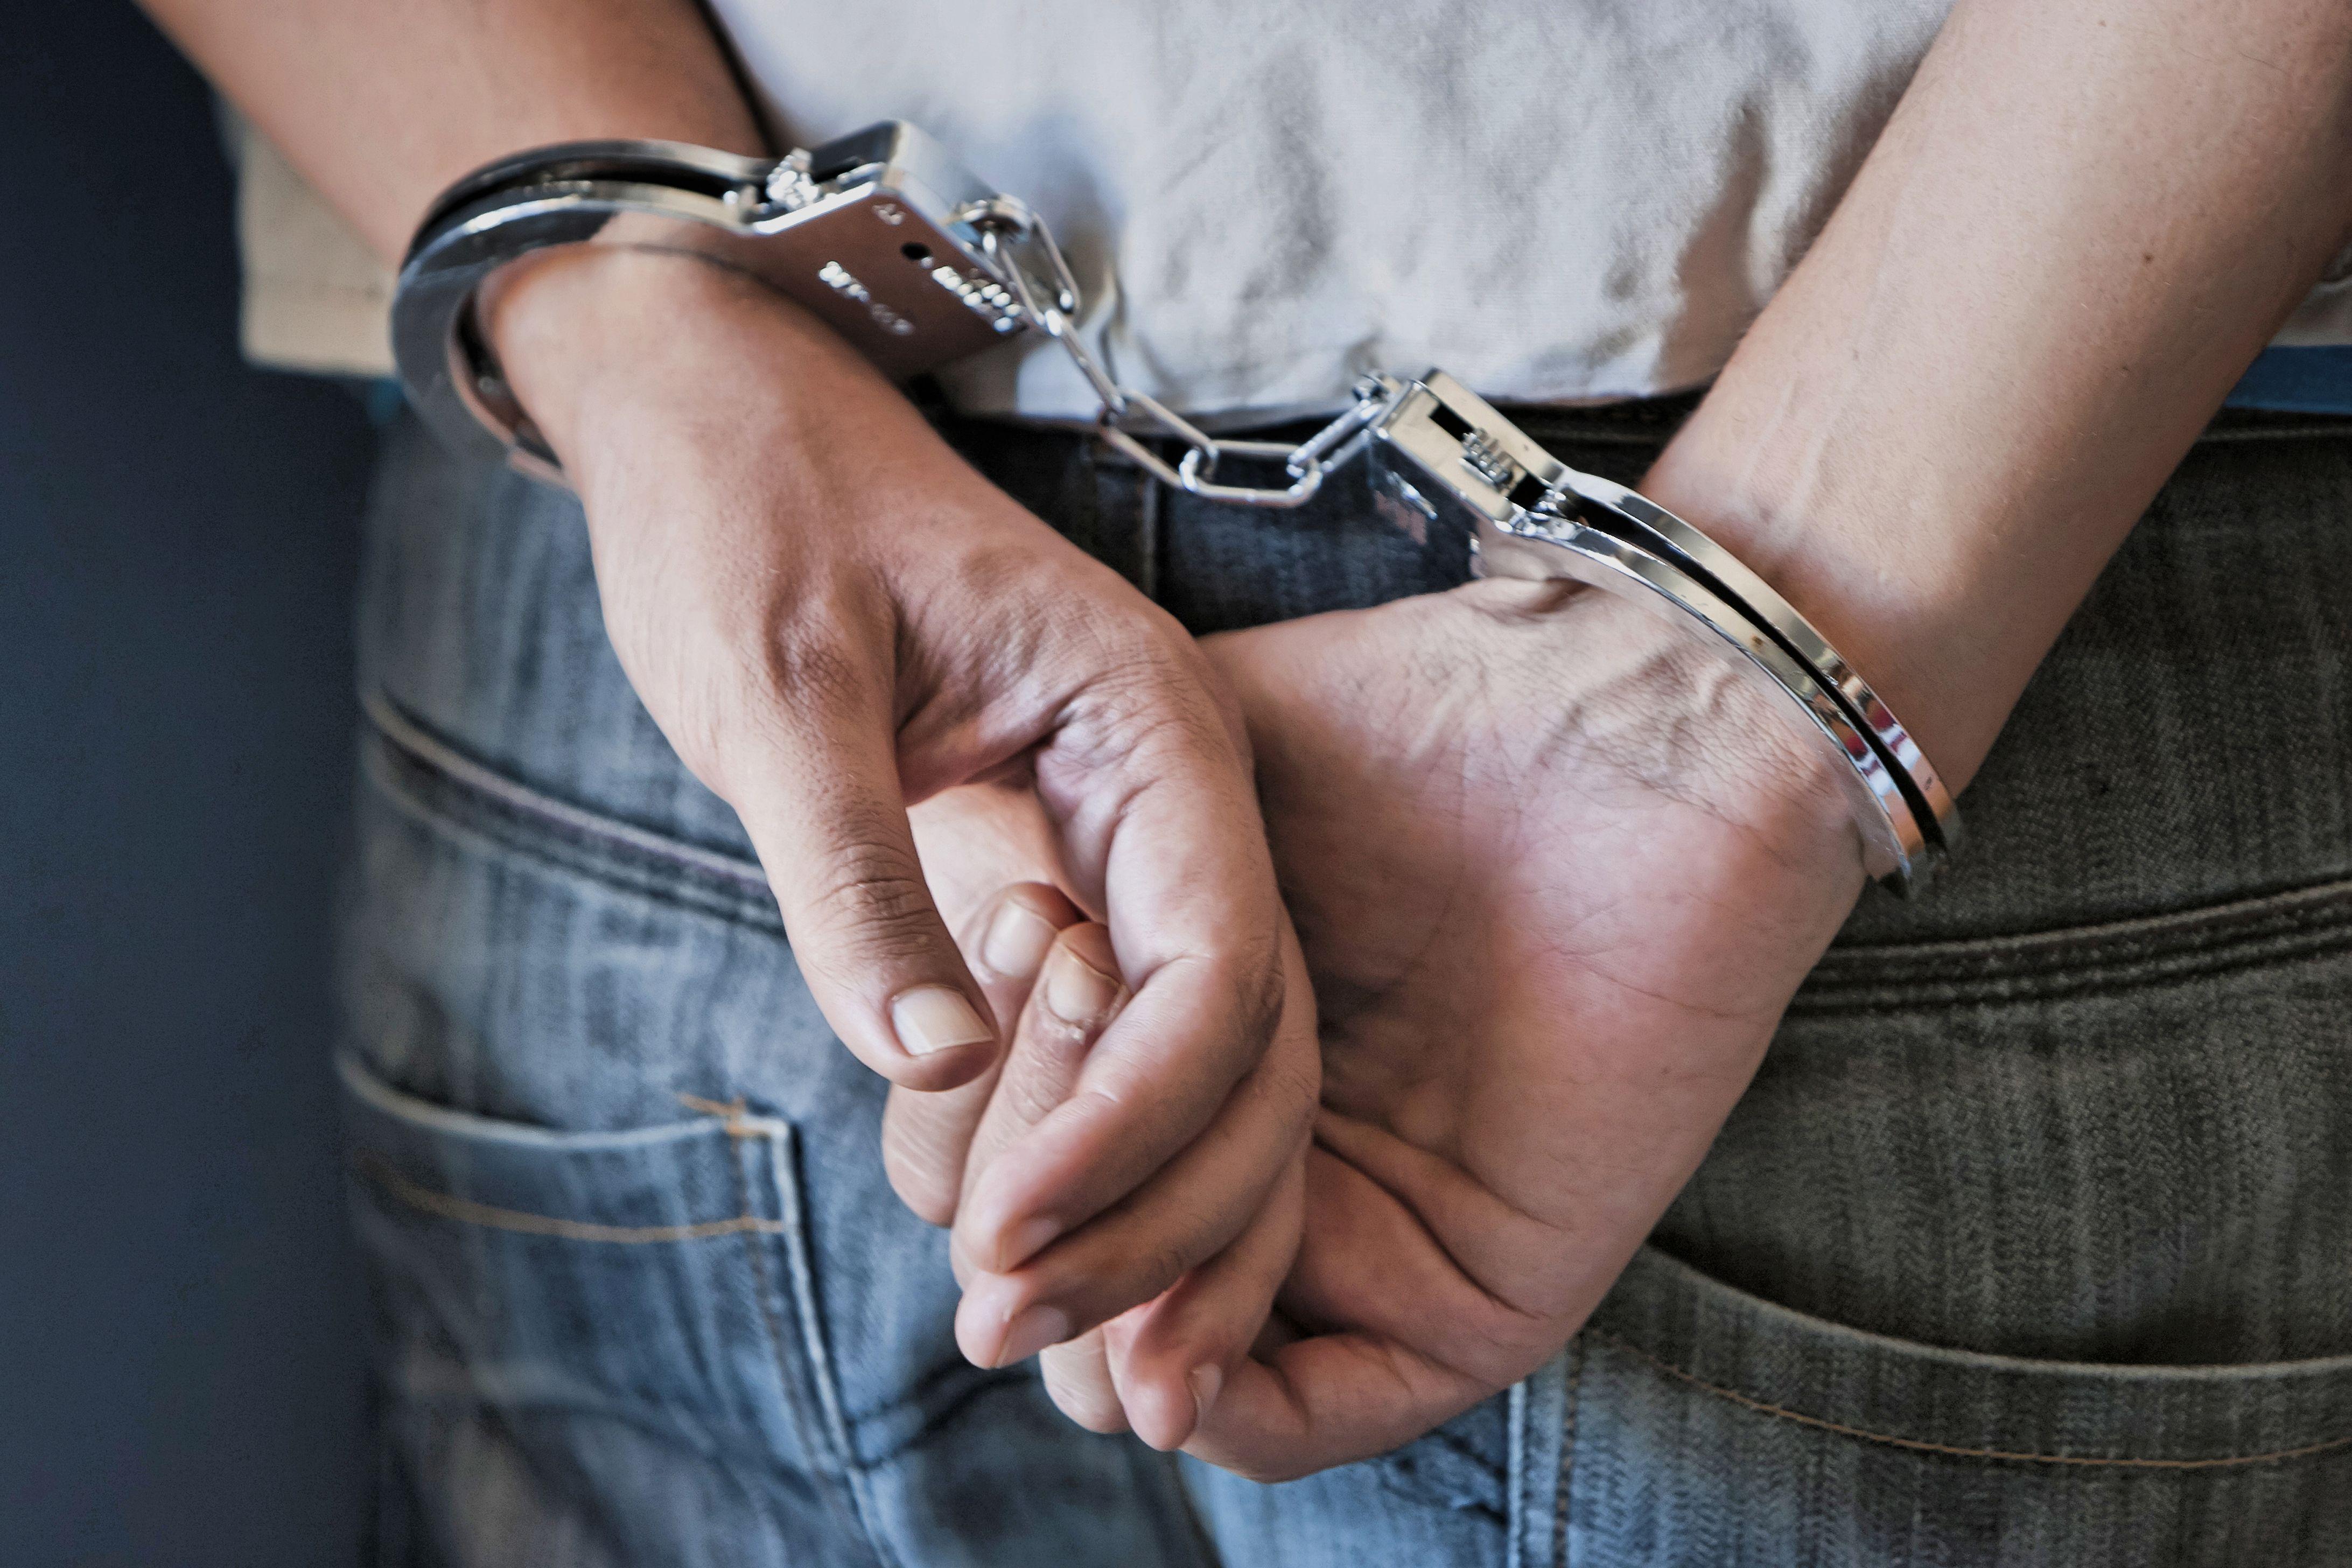 Derecho Penal: Servicios de Manuel Guisado Abogados